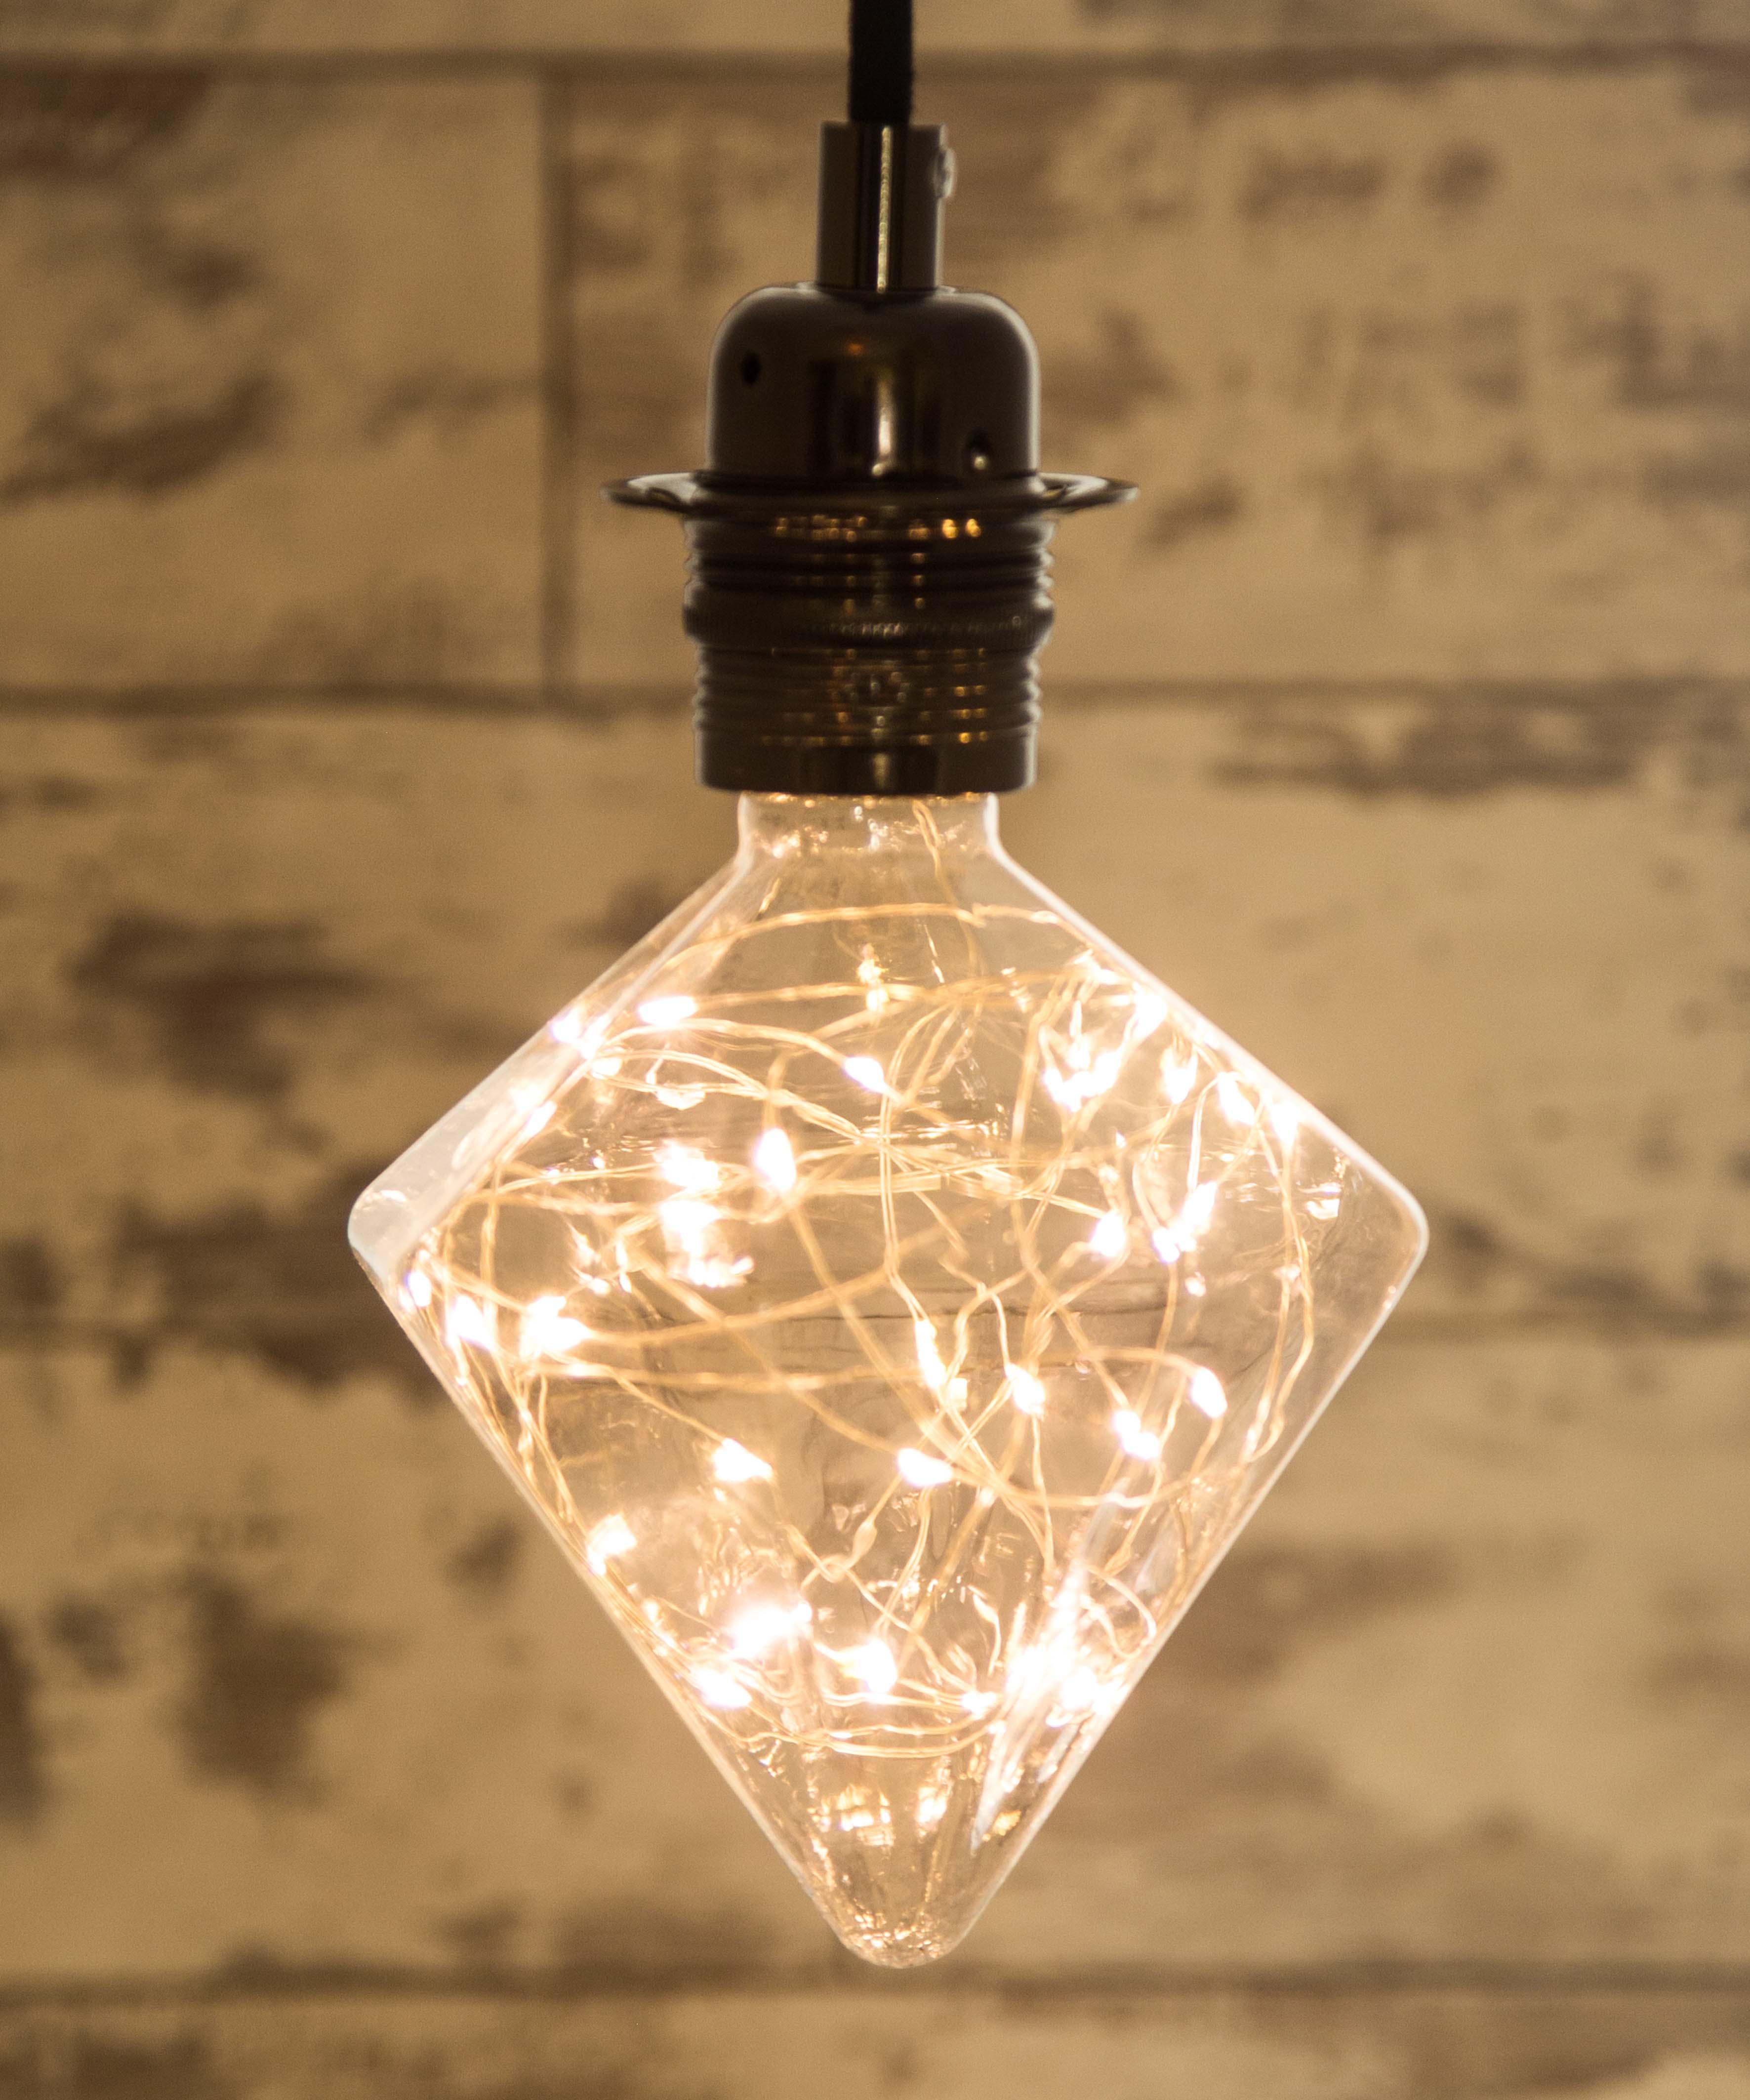 diamond designer decorative led light bulb 1 7w e27 long life. Black Bedroom Furniture Sets. Home Design Ideas